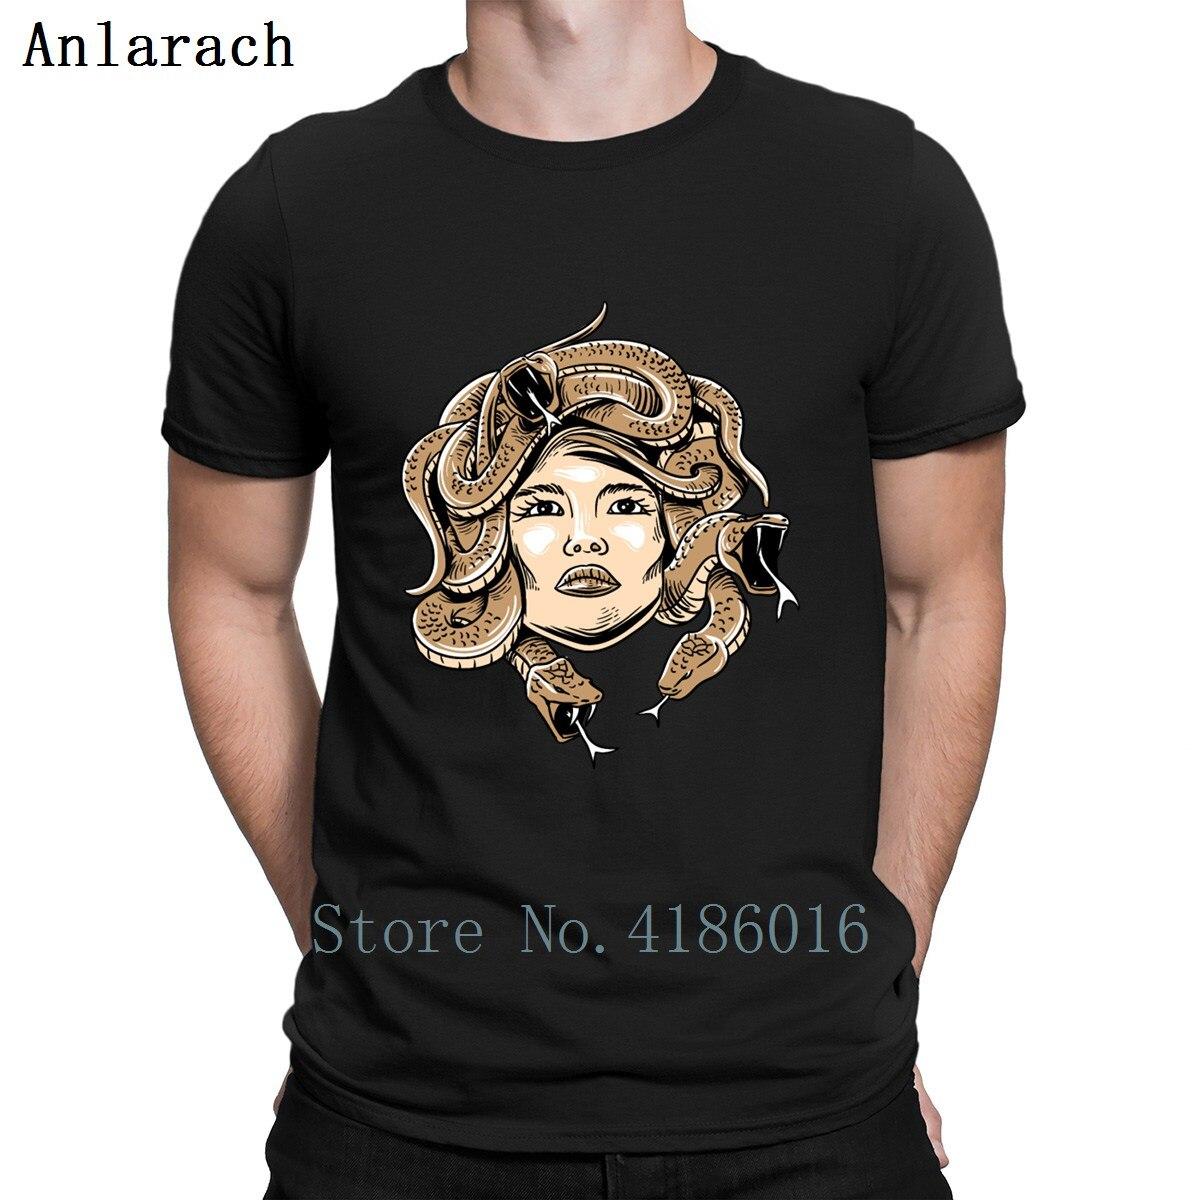 Greek Mythology Shirt Medusa Head Monsters Snake T Shirt Clever Summer Euro Size S-3xl Design Funny T Shirts Basic Solid Letter